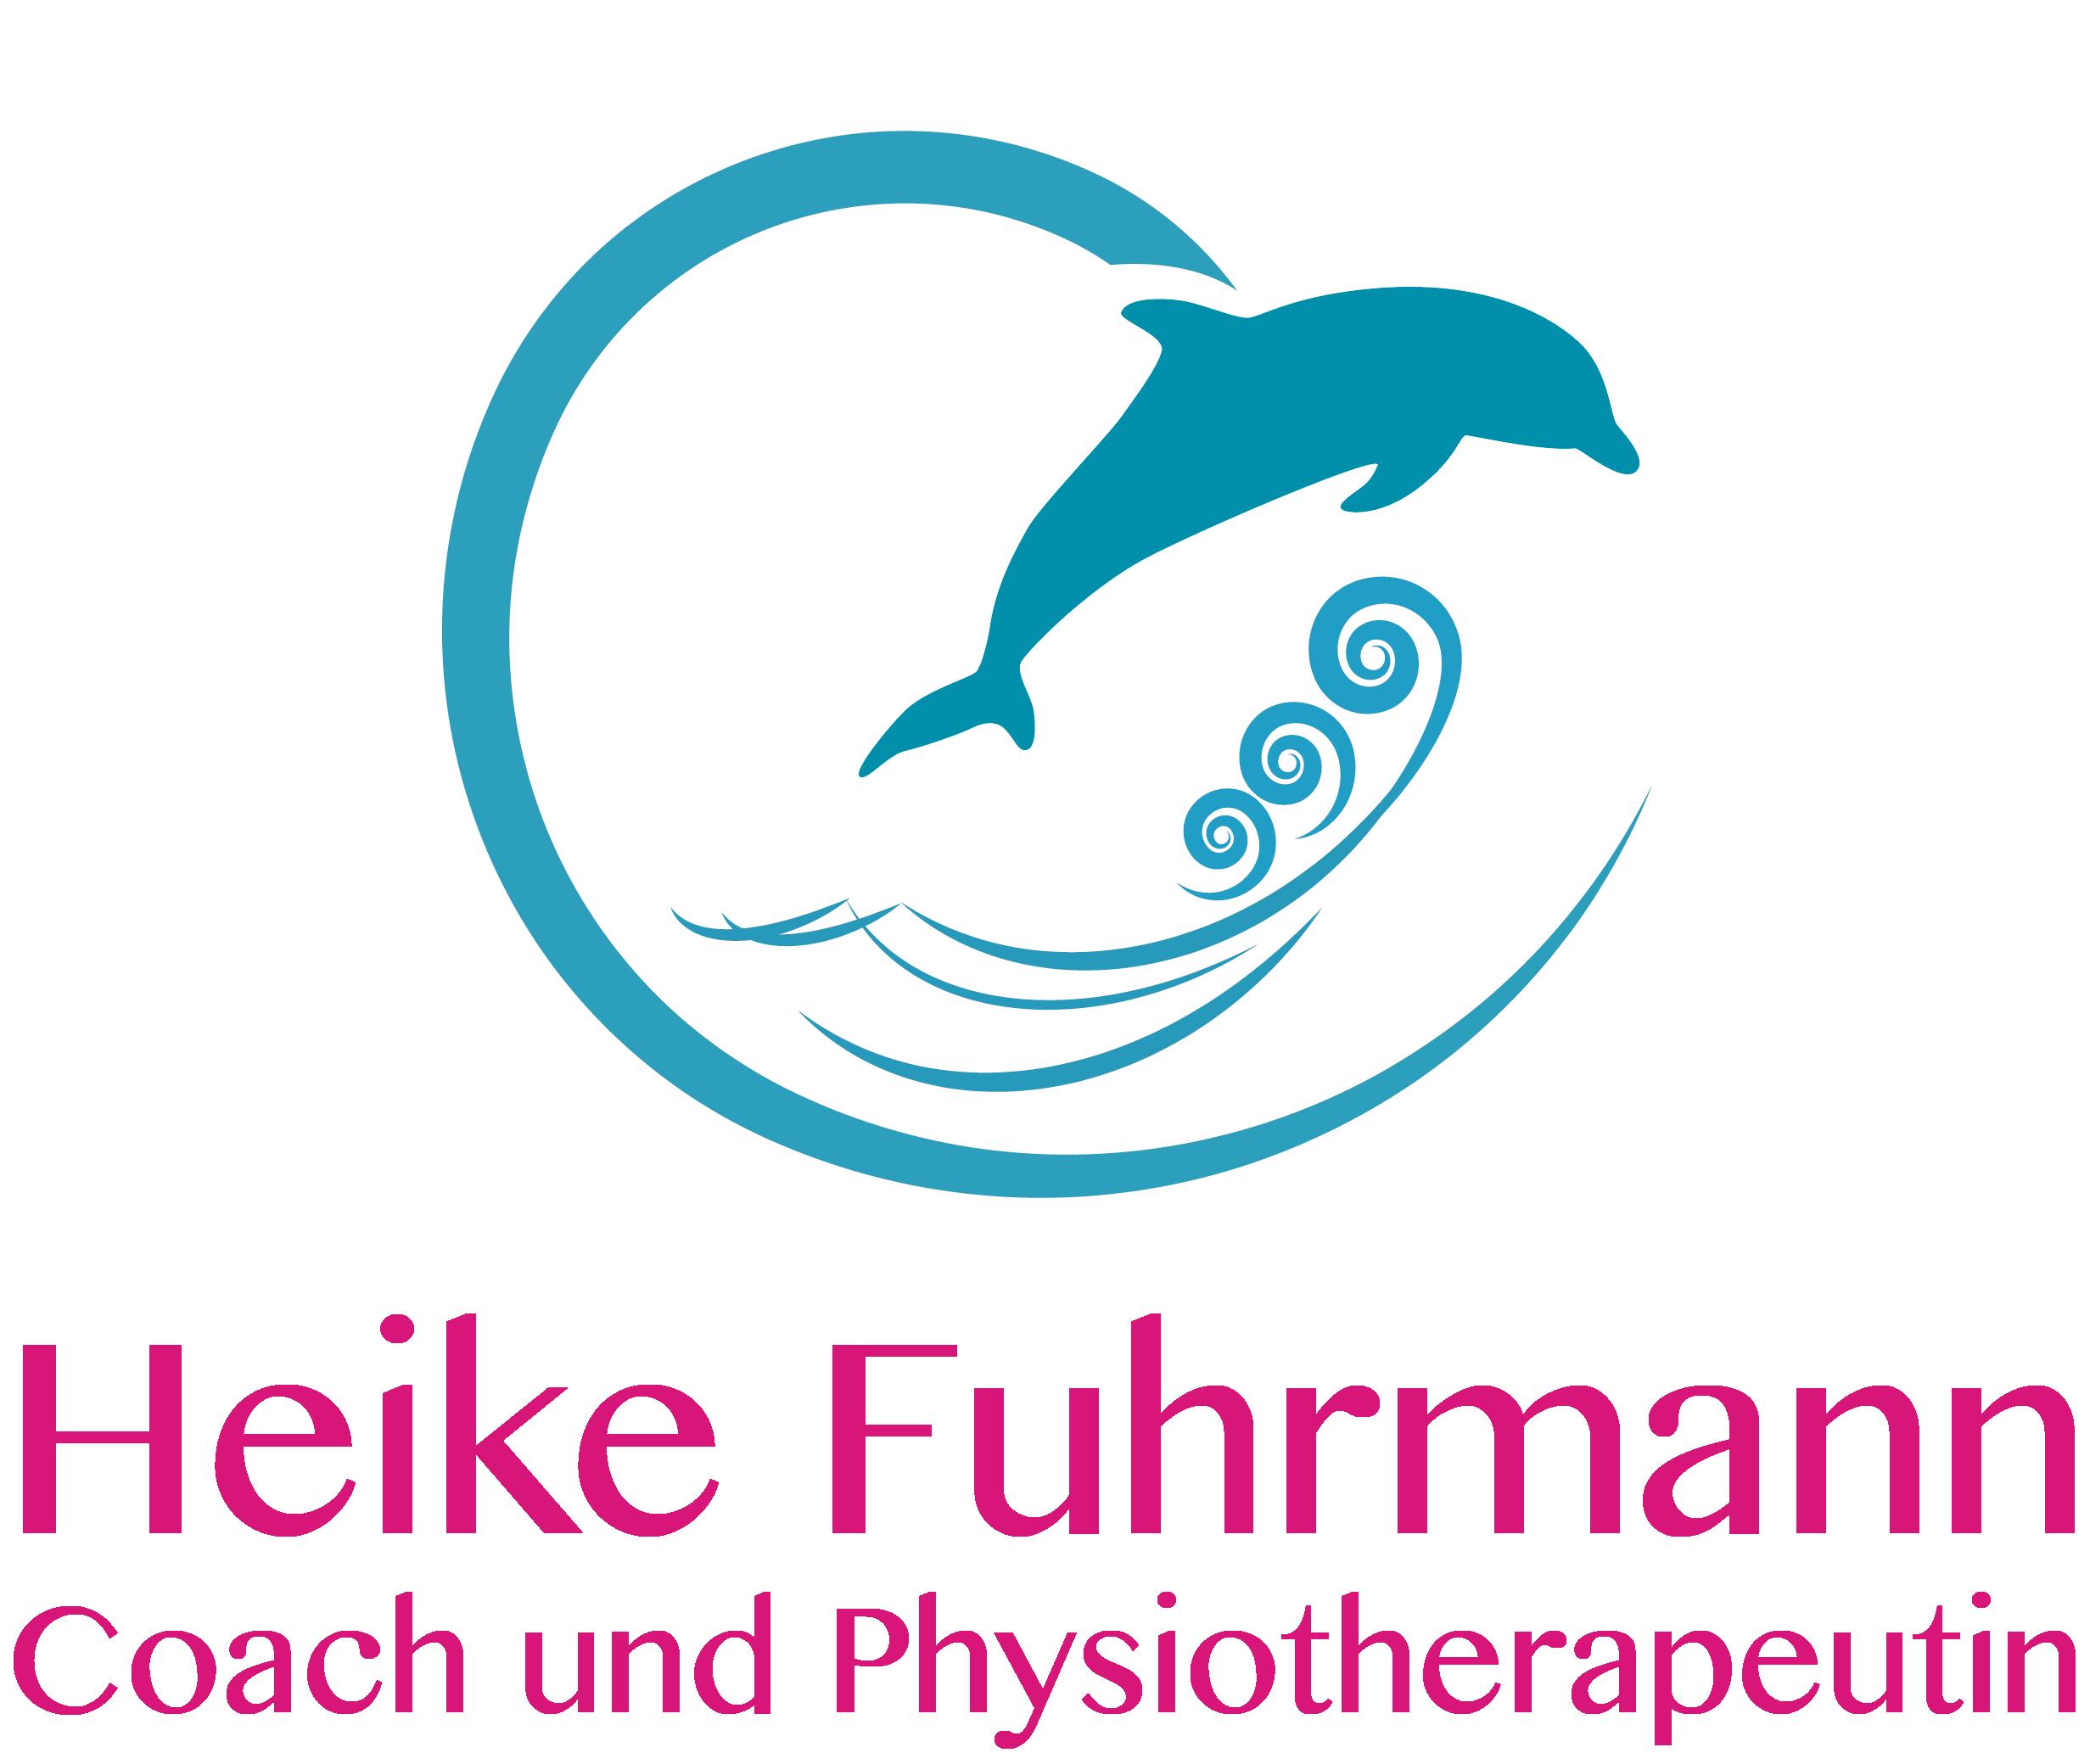 Heike Fuhrmann – MentalCoach und Physiotherapeutin